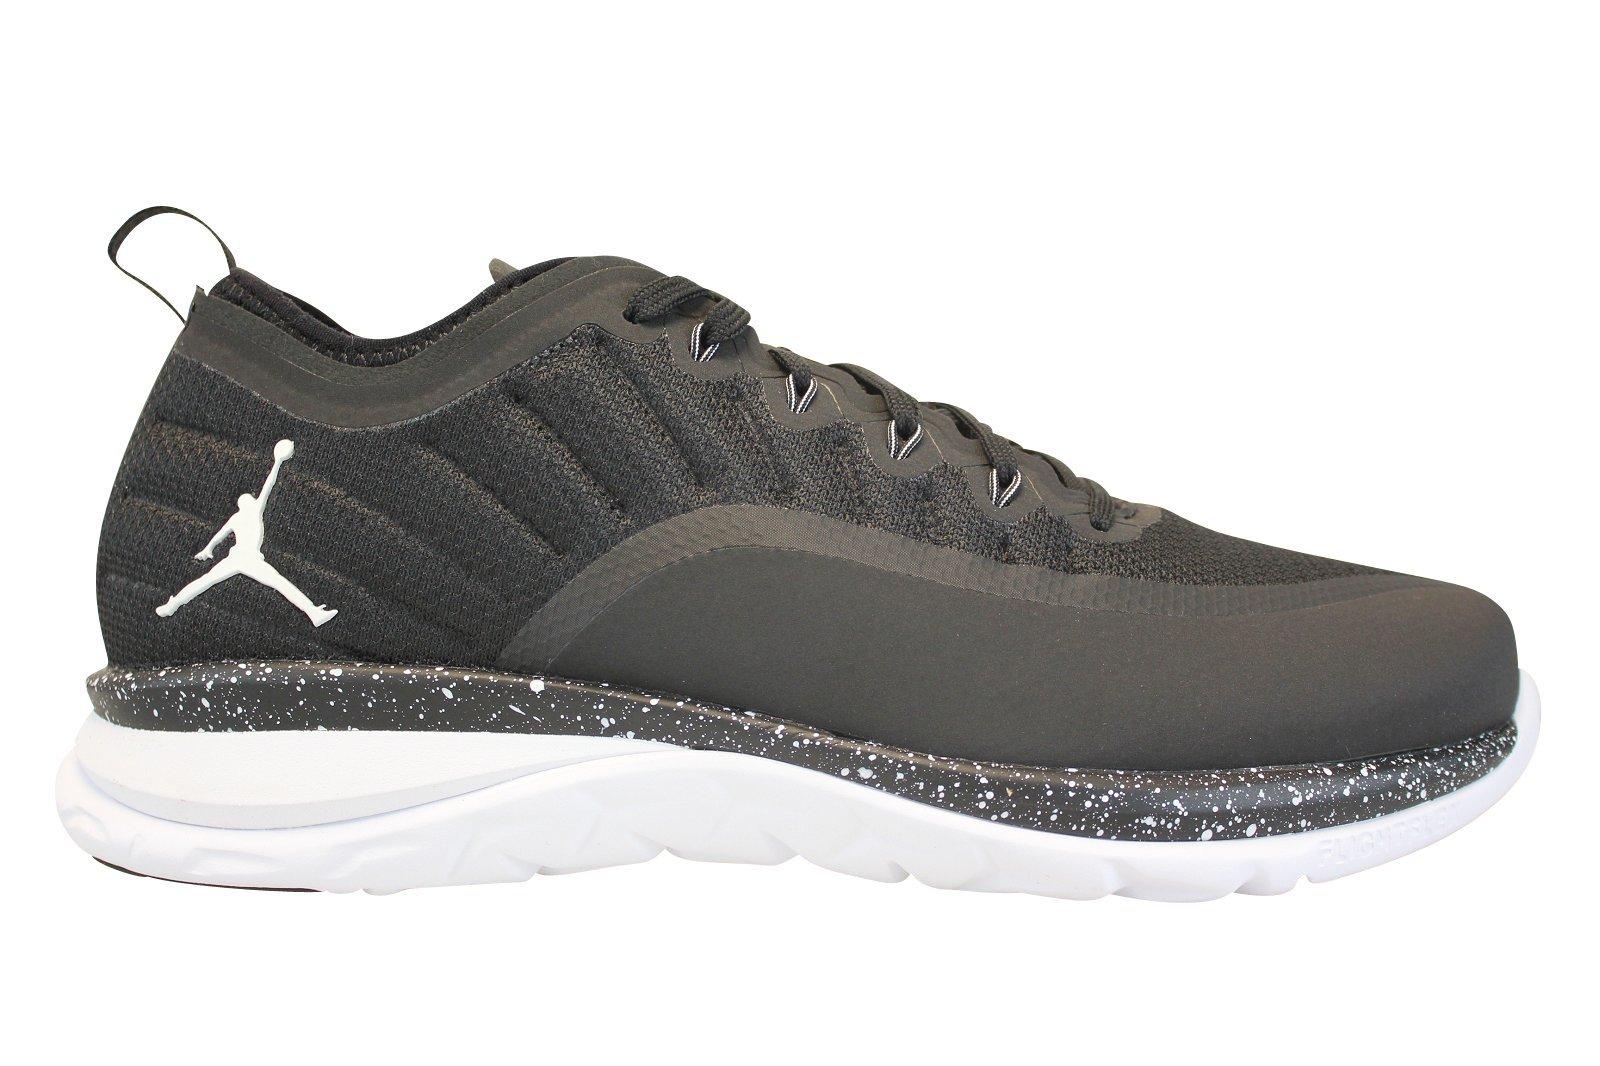 644ff02b62e3bf Galleon - Nike Mens Jordan Trainer Prime Training Shoe Black White 10.5